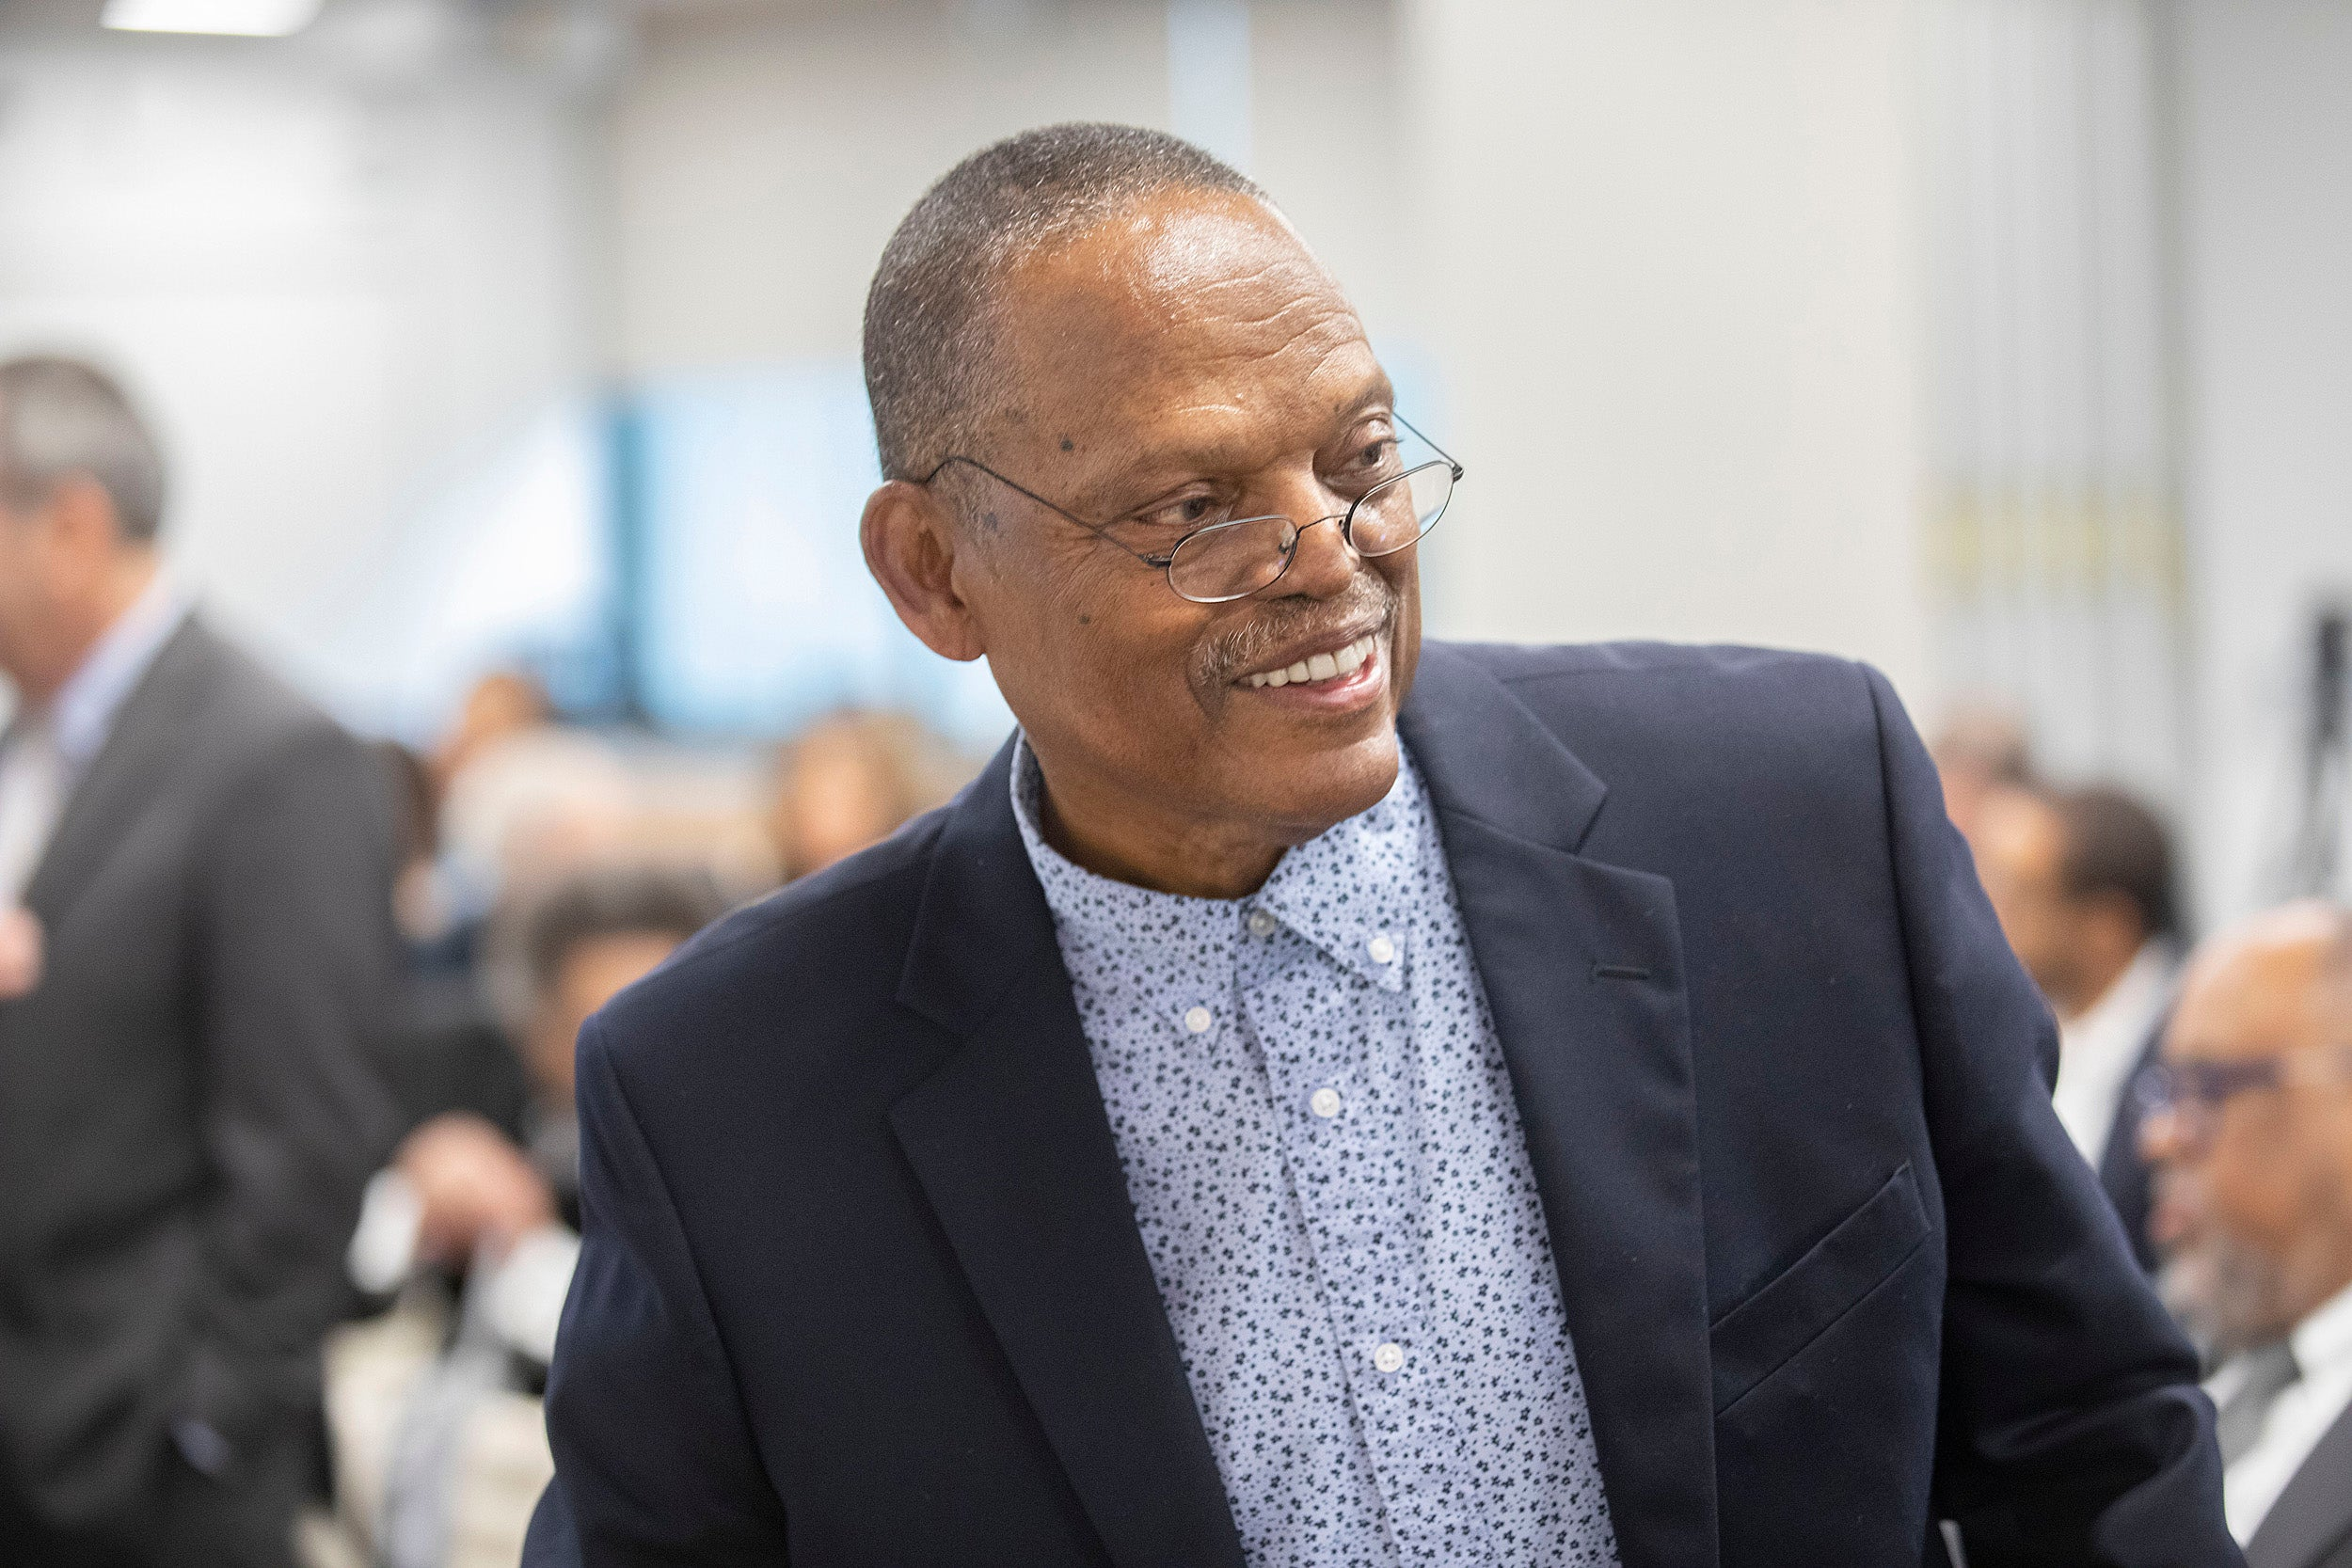 Harvard symposium honors William Julius Wilson's five decades of work toward racial justice